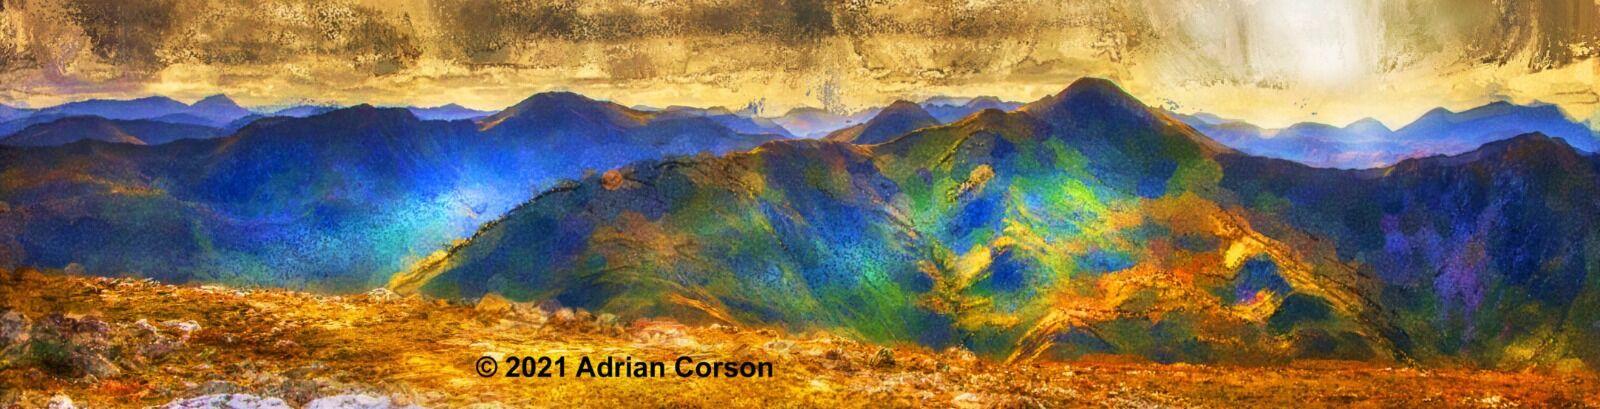 160-sunlite mountains